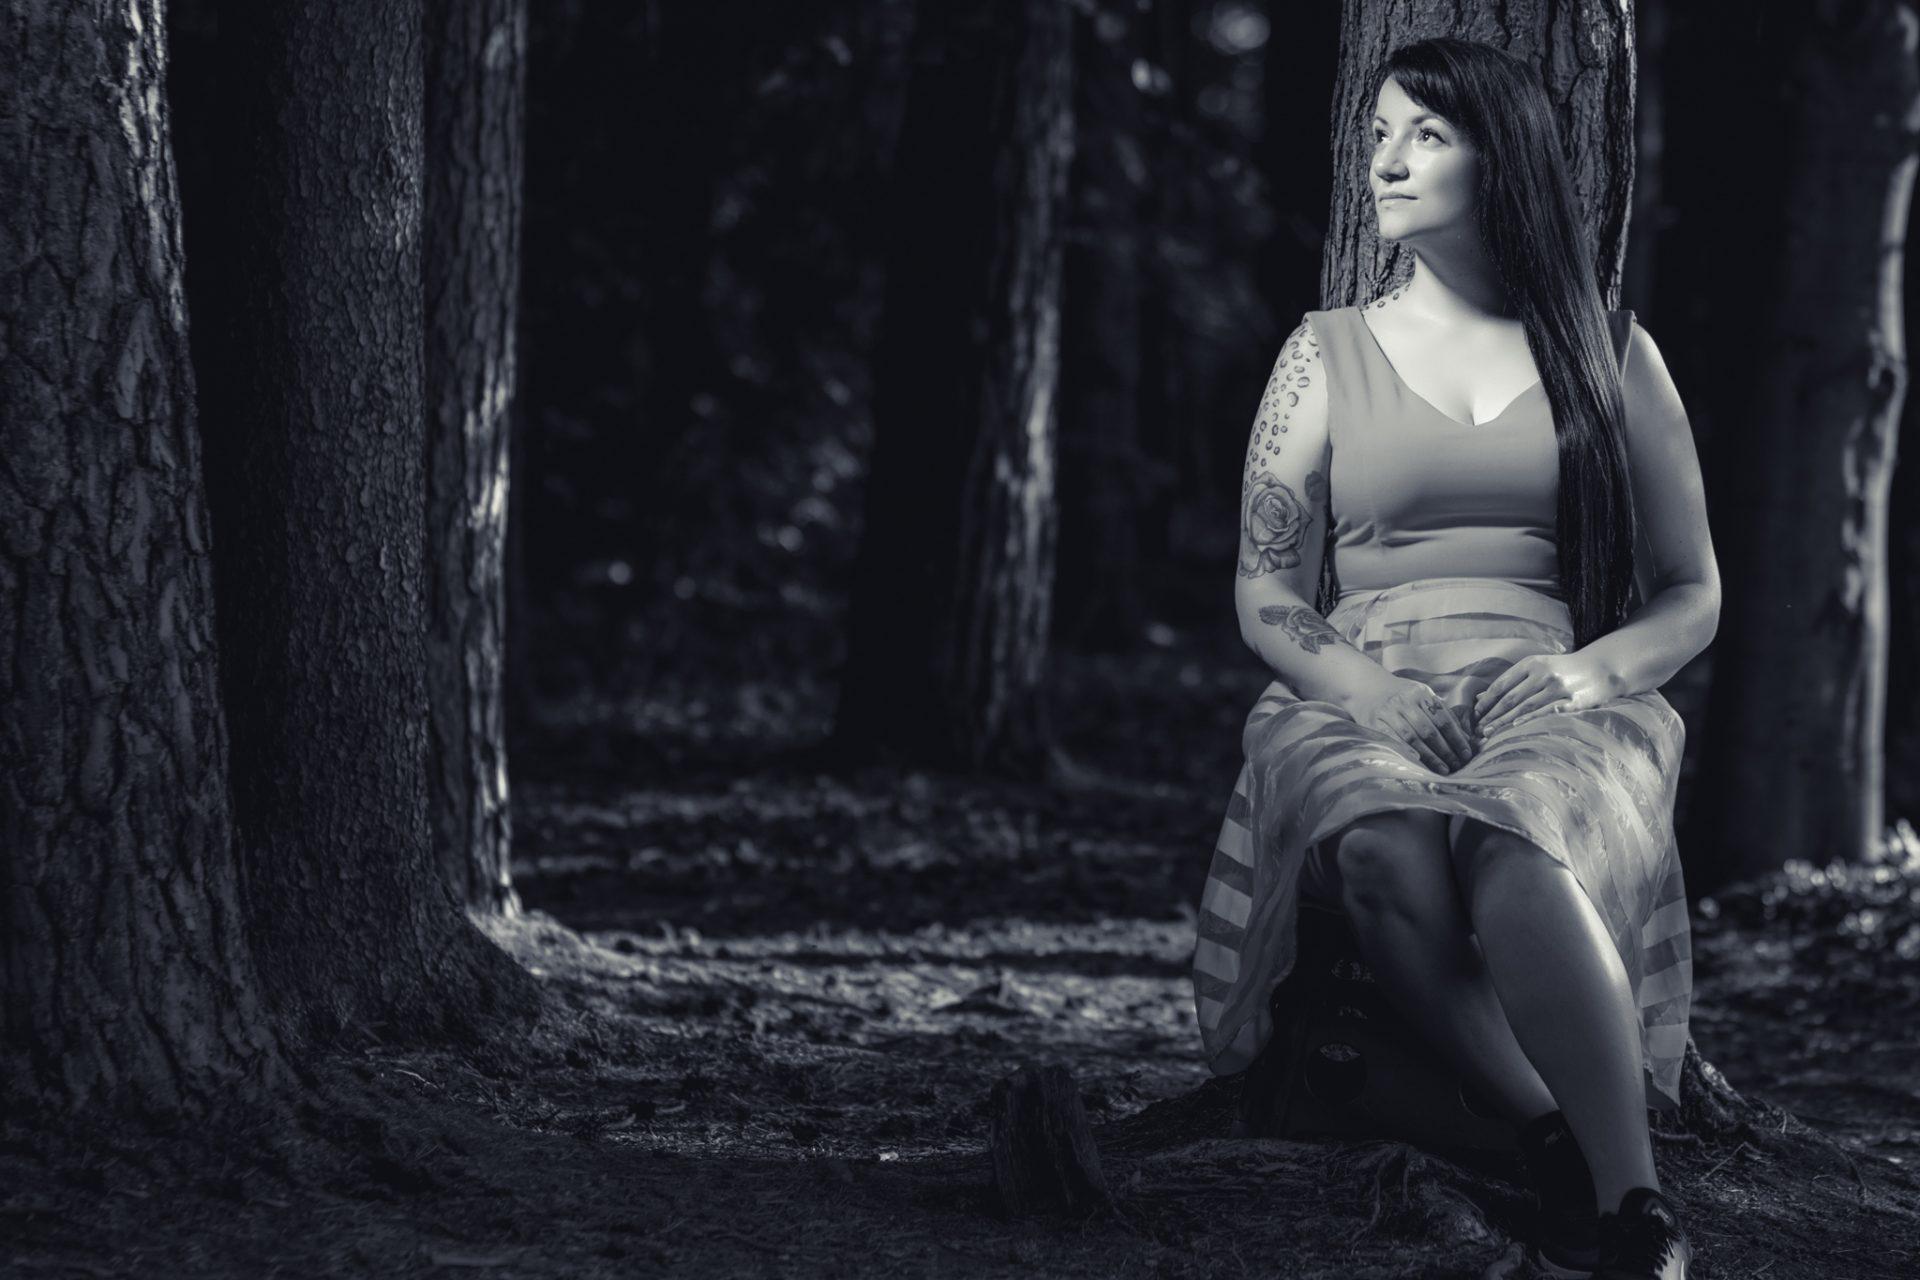 People-Fotografie im Wald